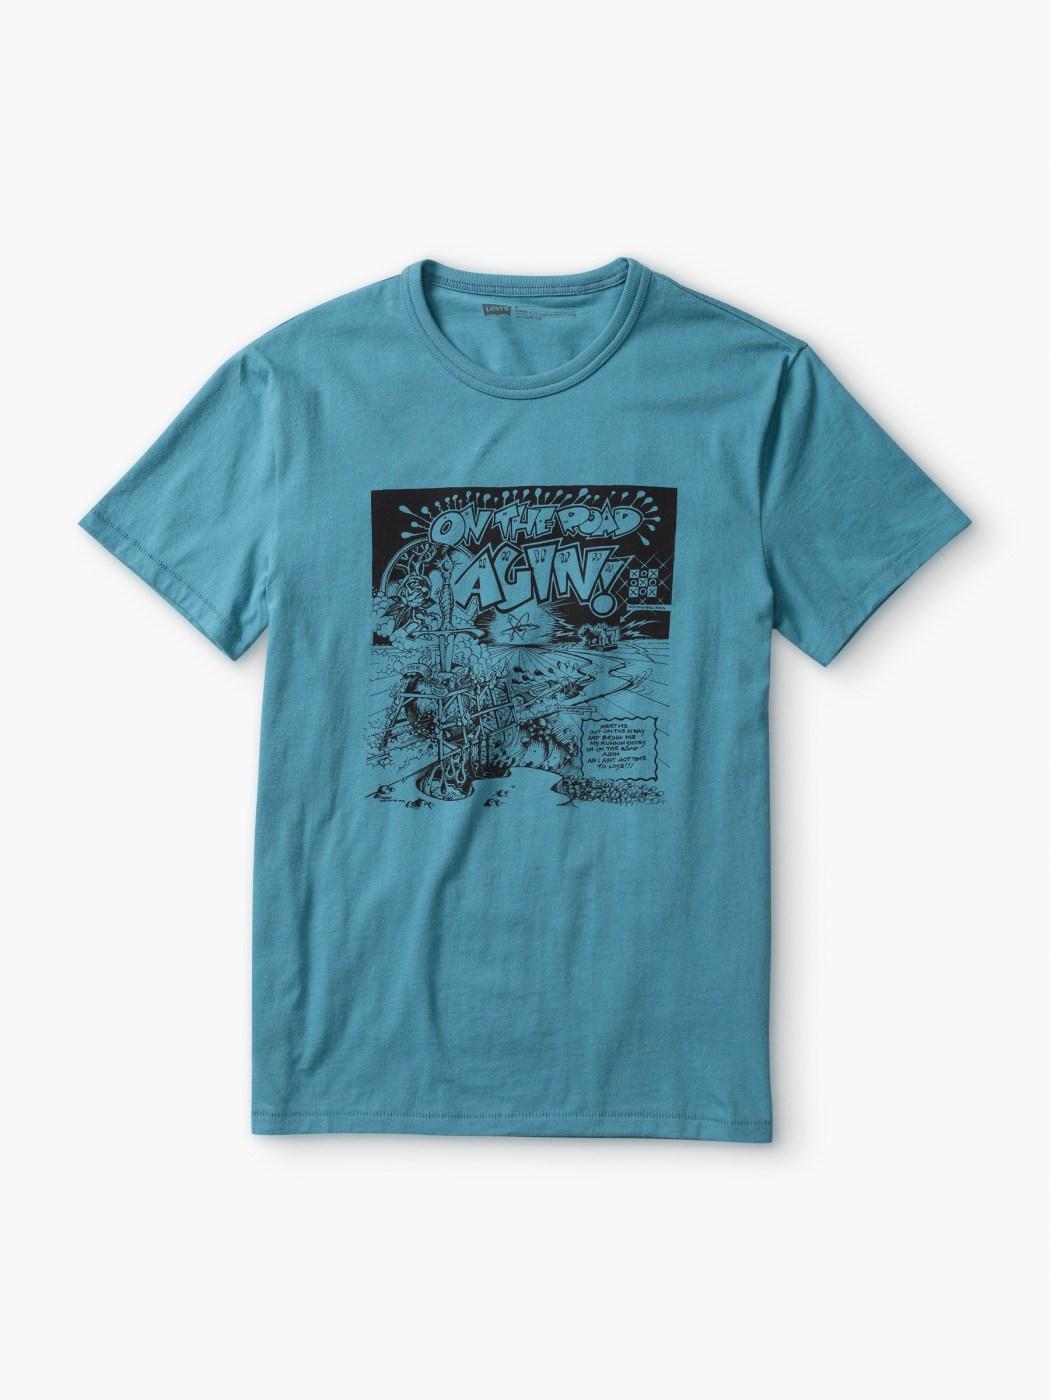 LEVIS X Rick Griffin 聯名款男裝_藍色圖案T